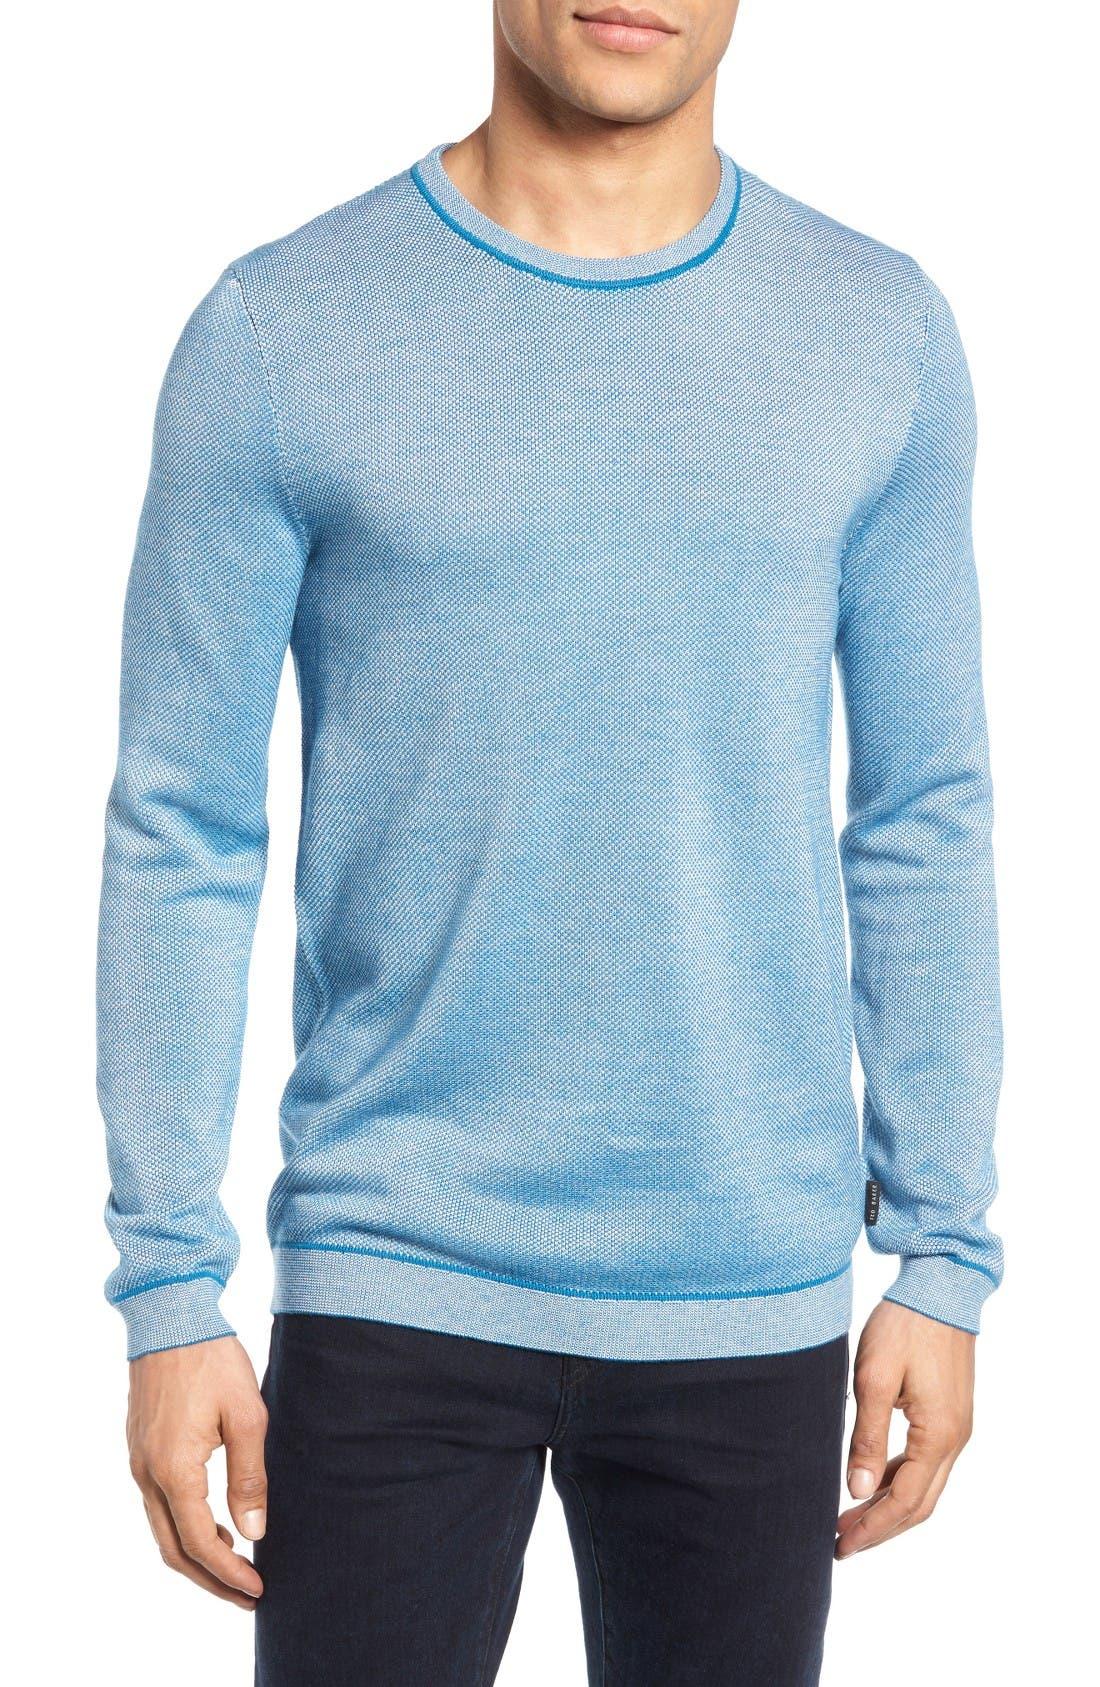 TED BAKER LONDON Millar Jacquard Sweater